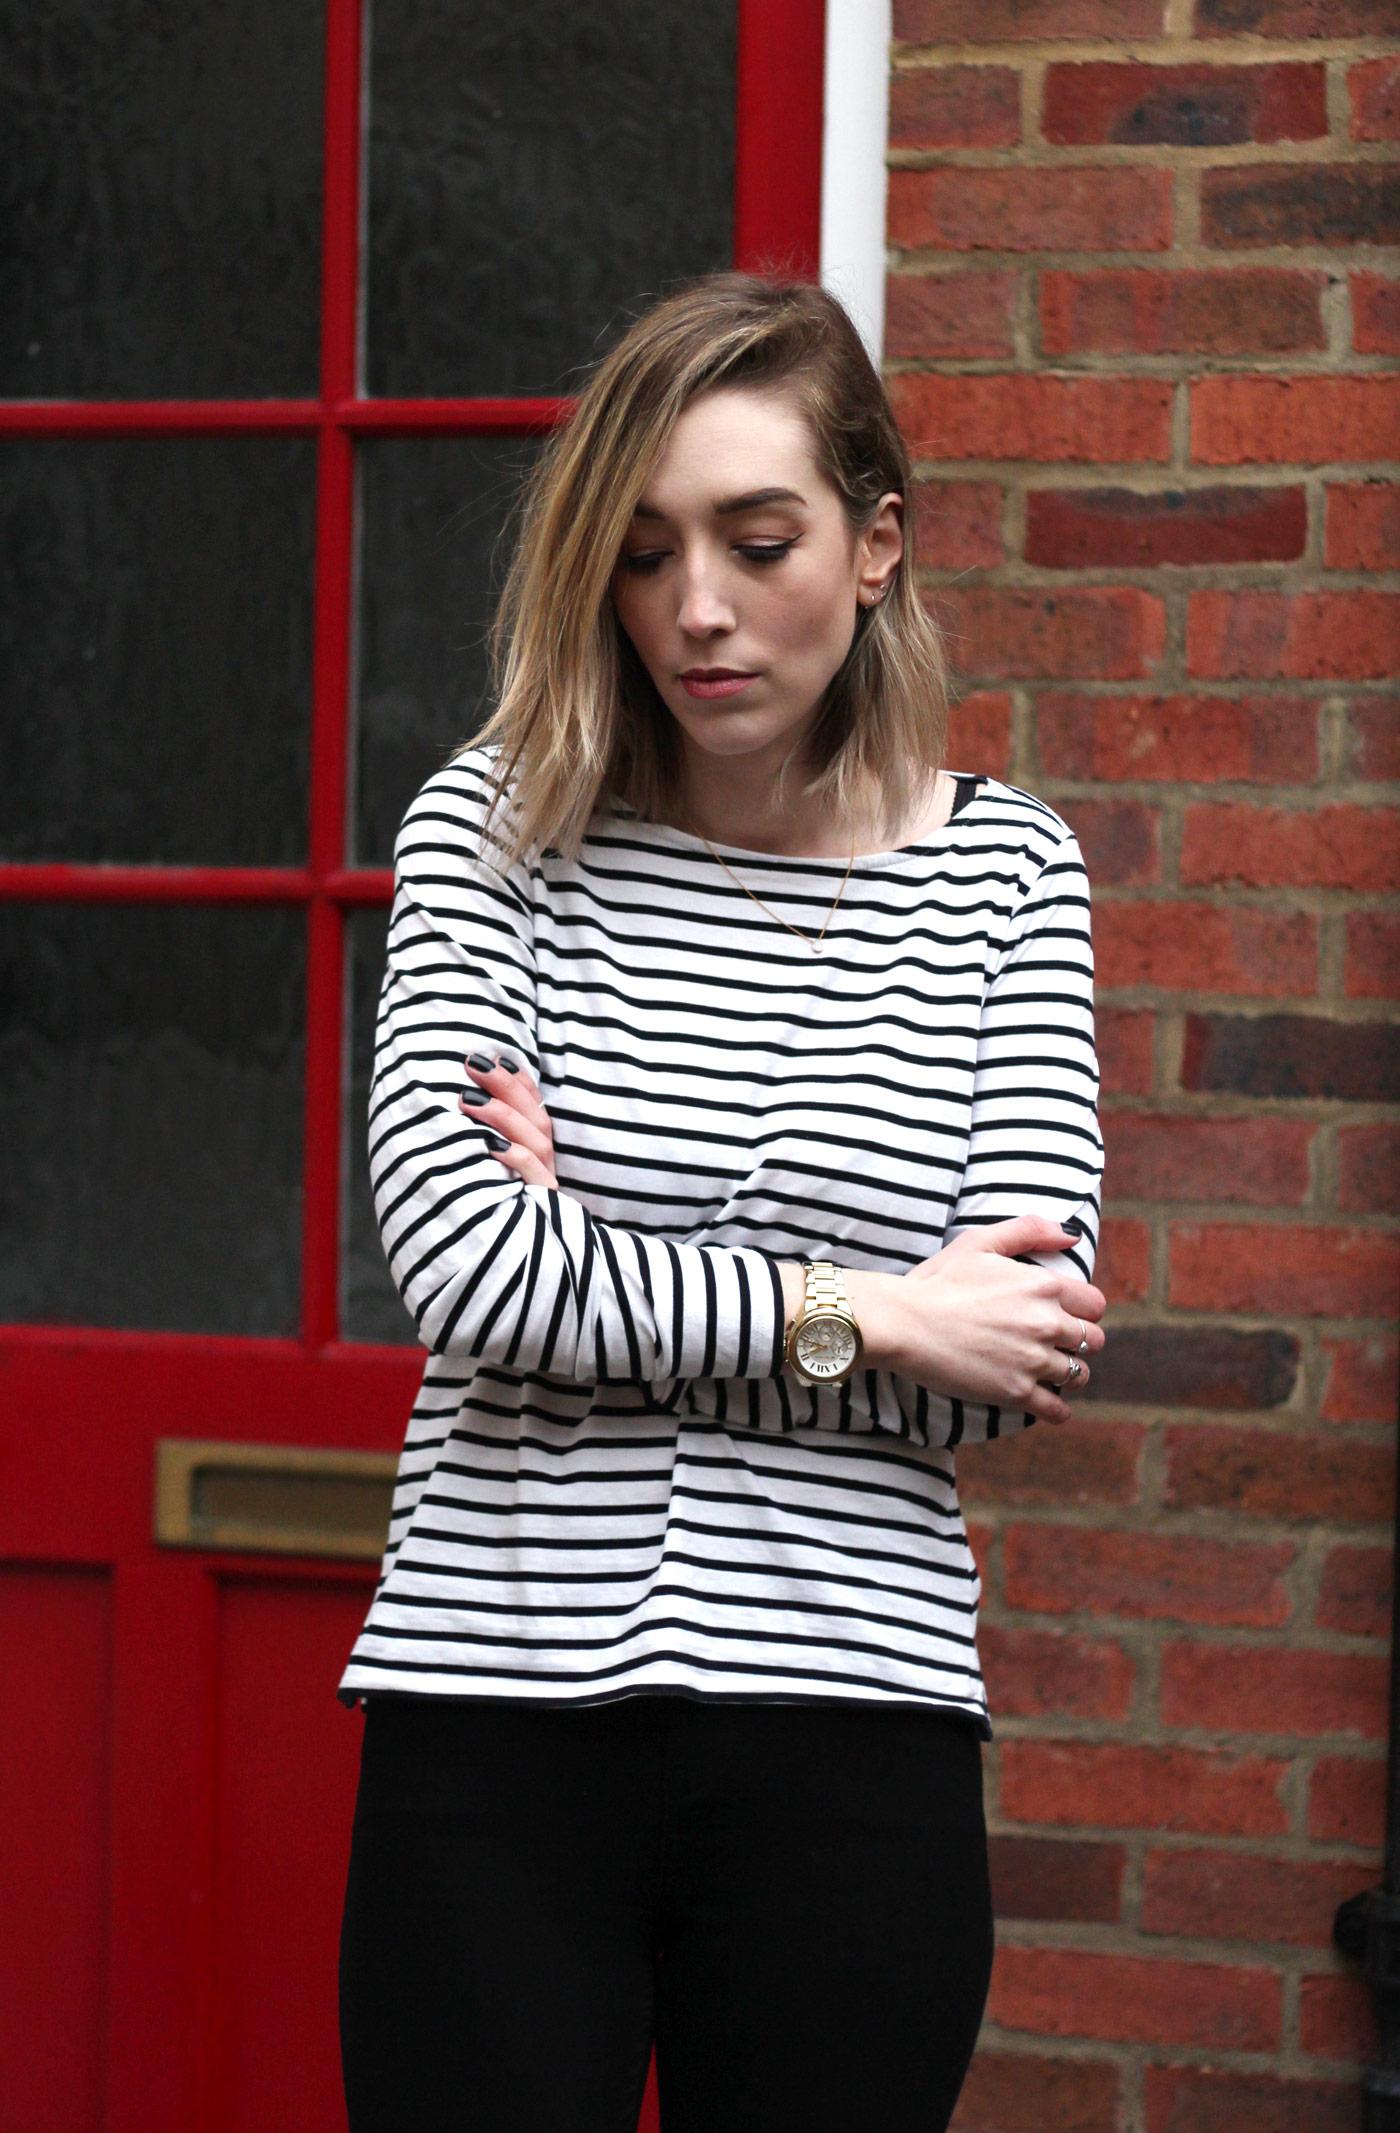 boden-breton-stripe-top-black-and-white